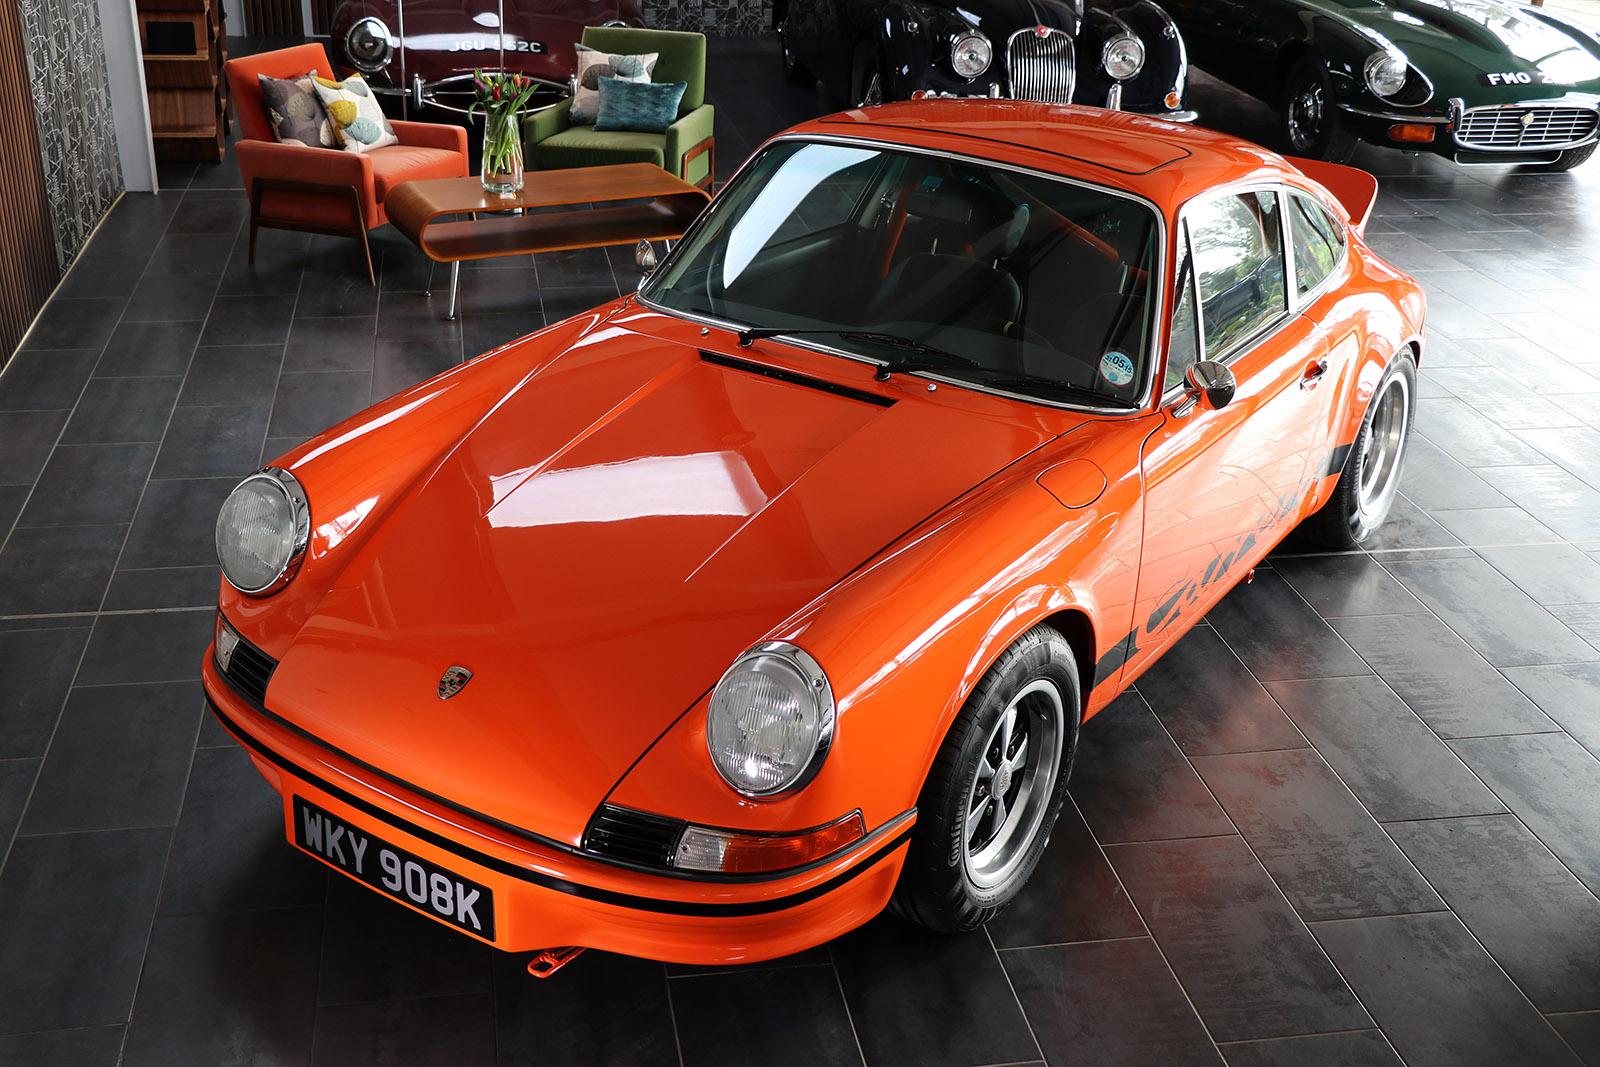 1972-Porsche 911 S-orange-evocation-sayer selection-1-web.jpg